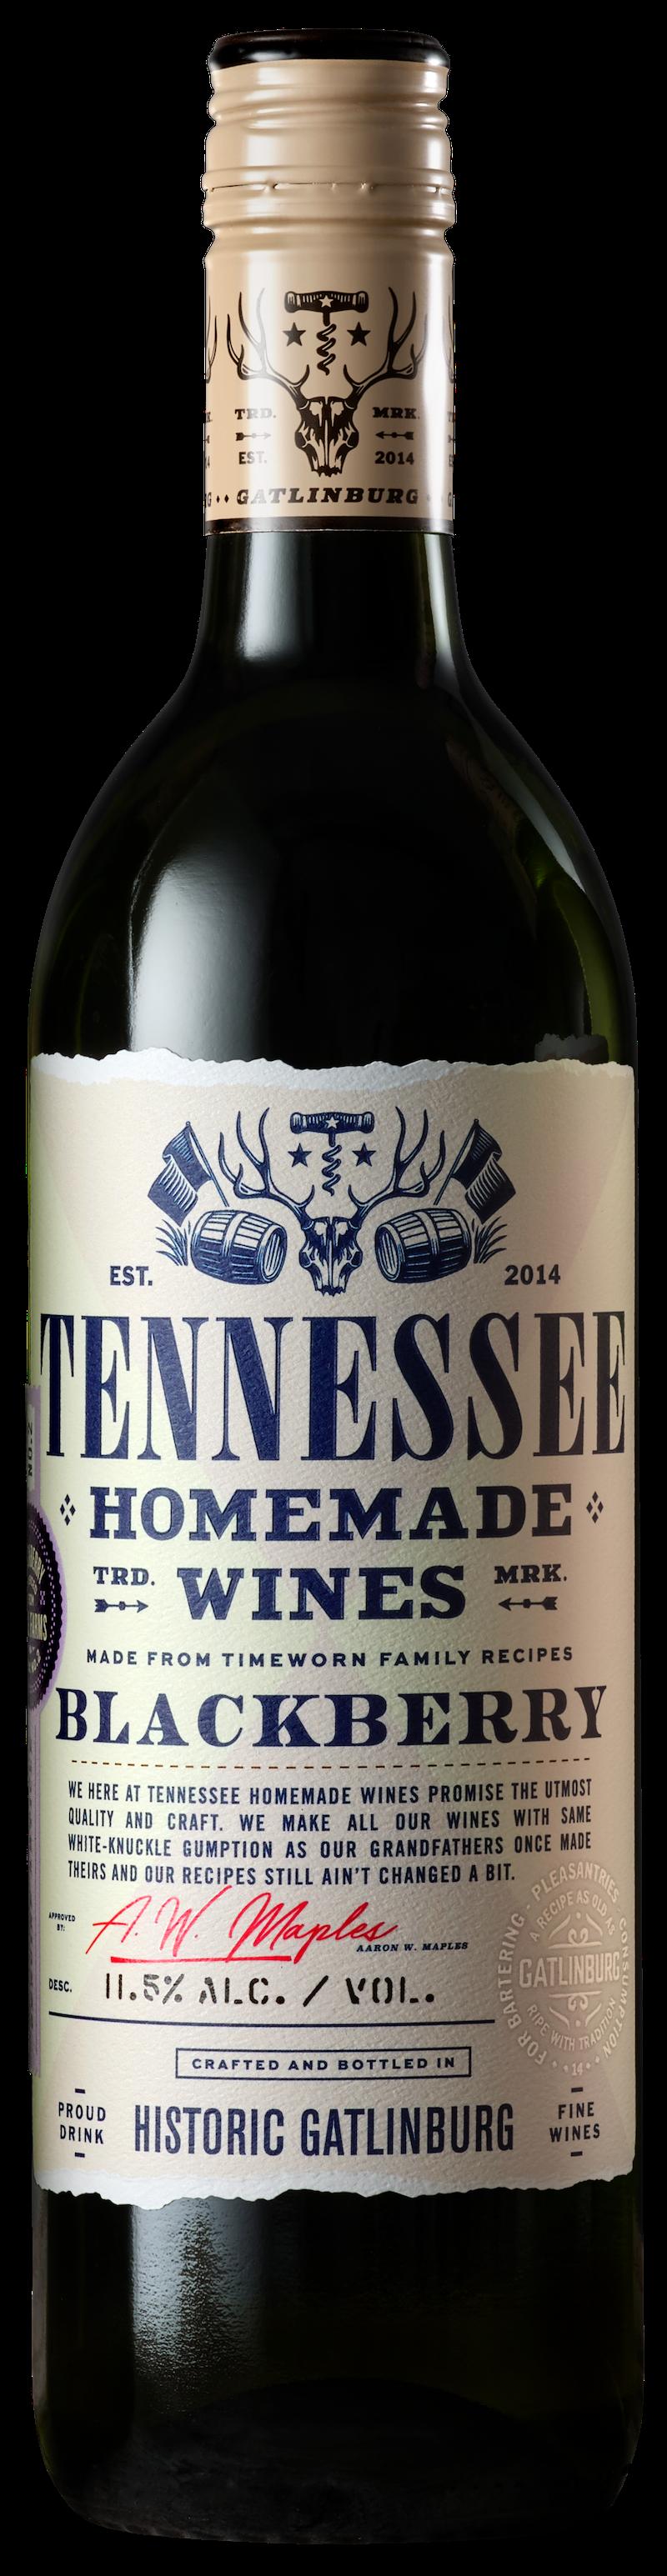 Tennessee Homemade Wines blackberry wine